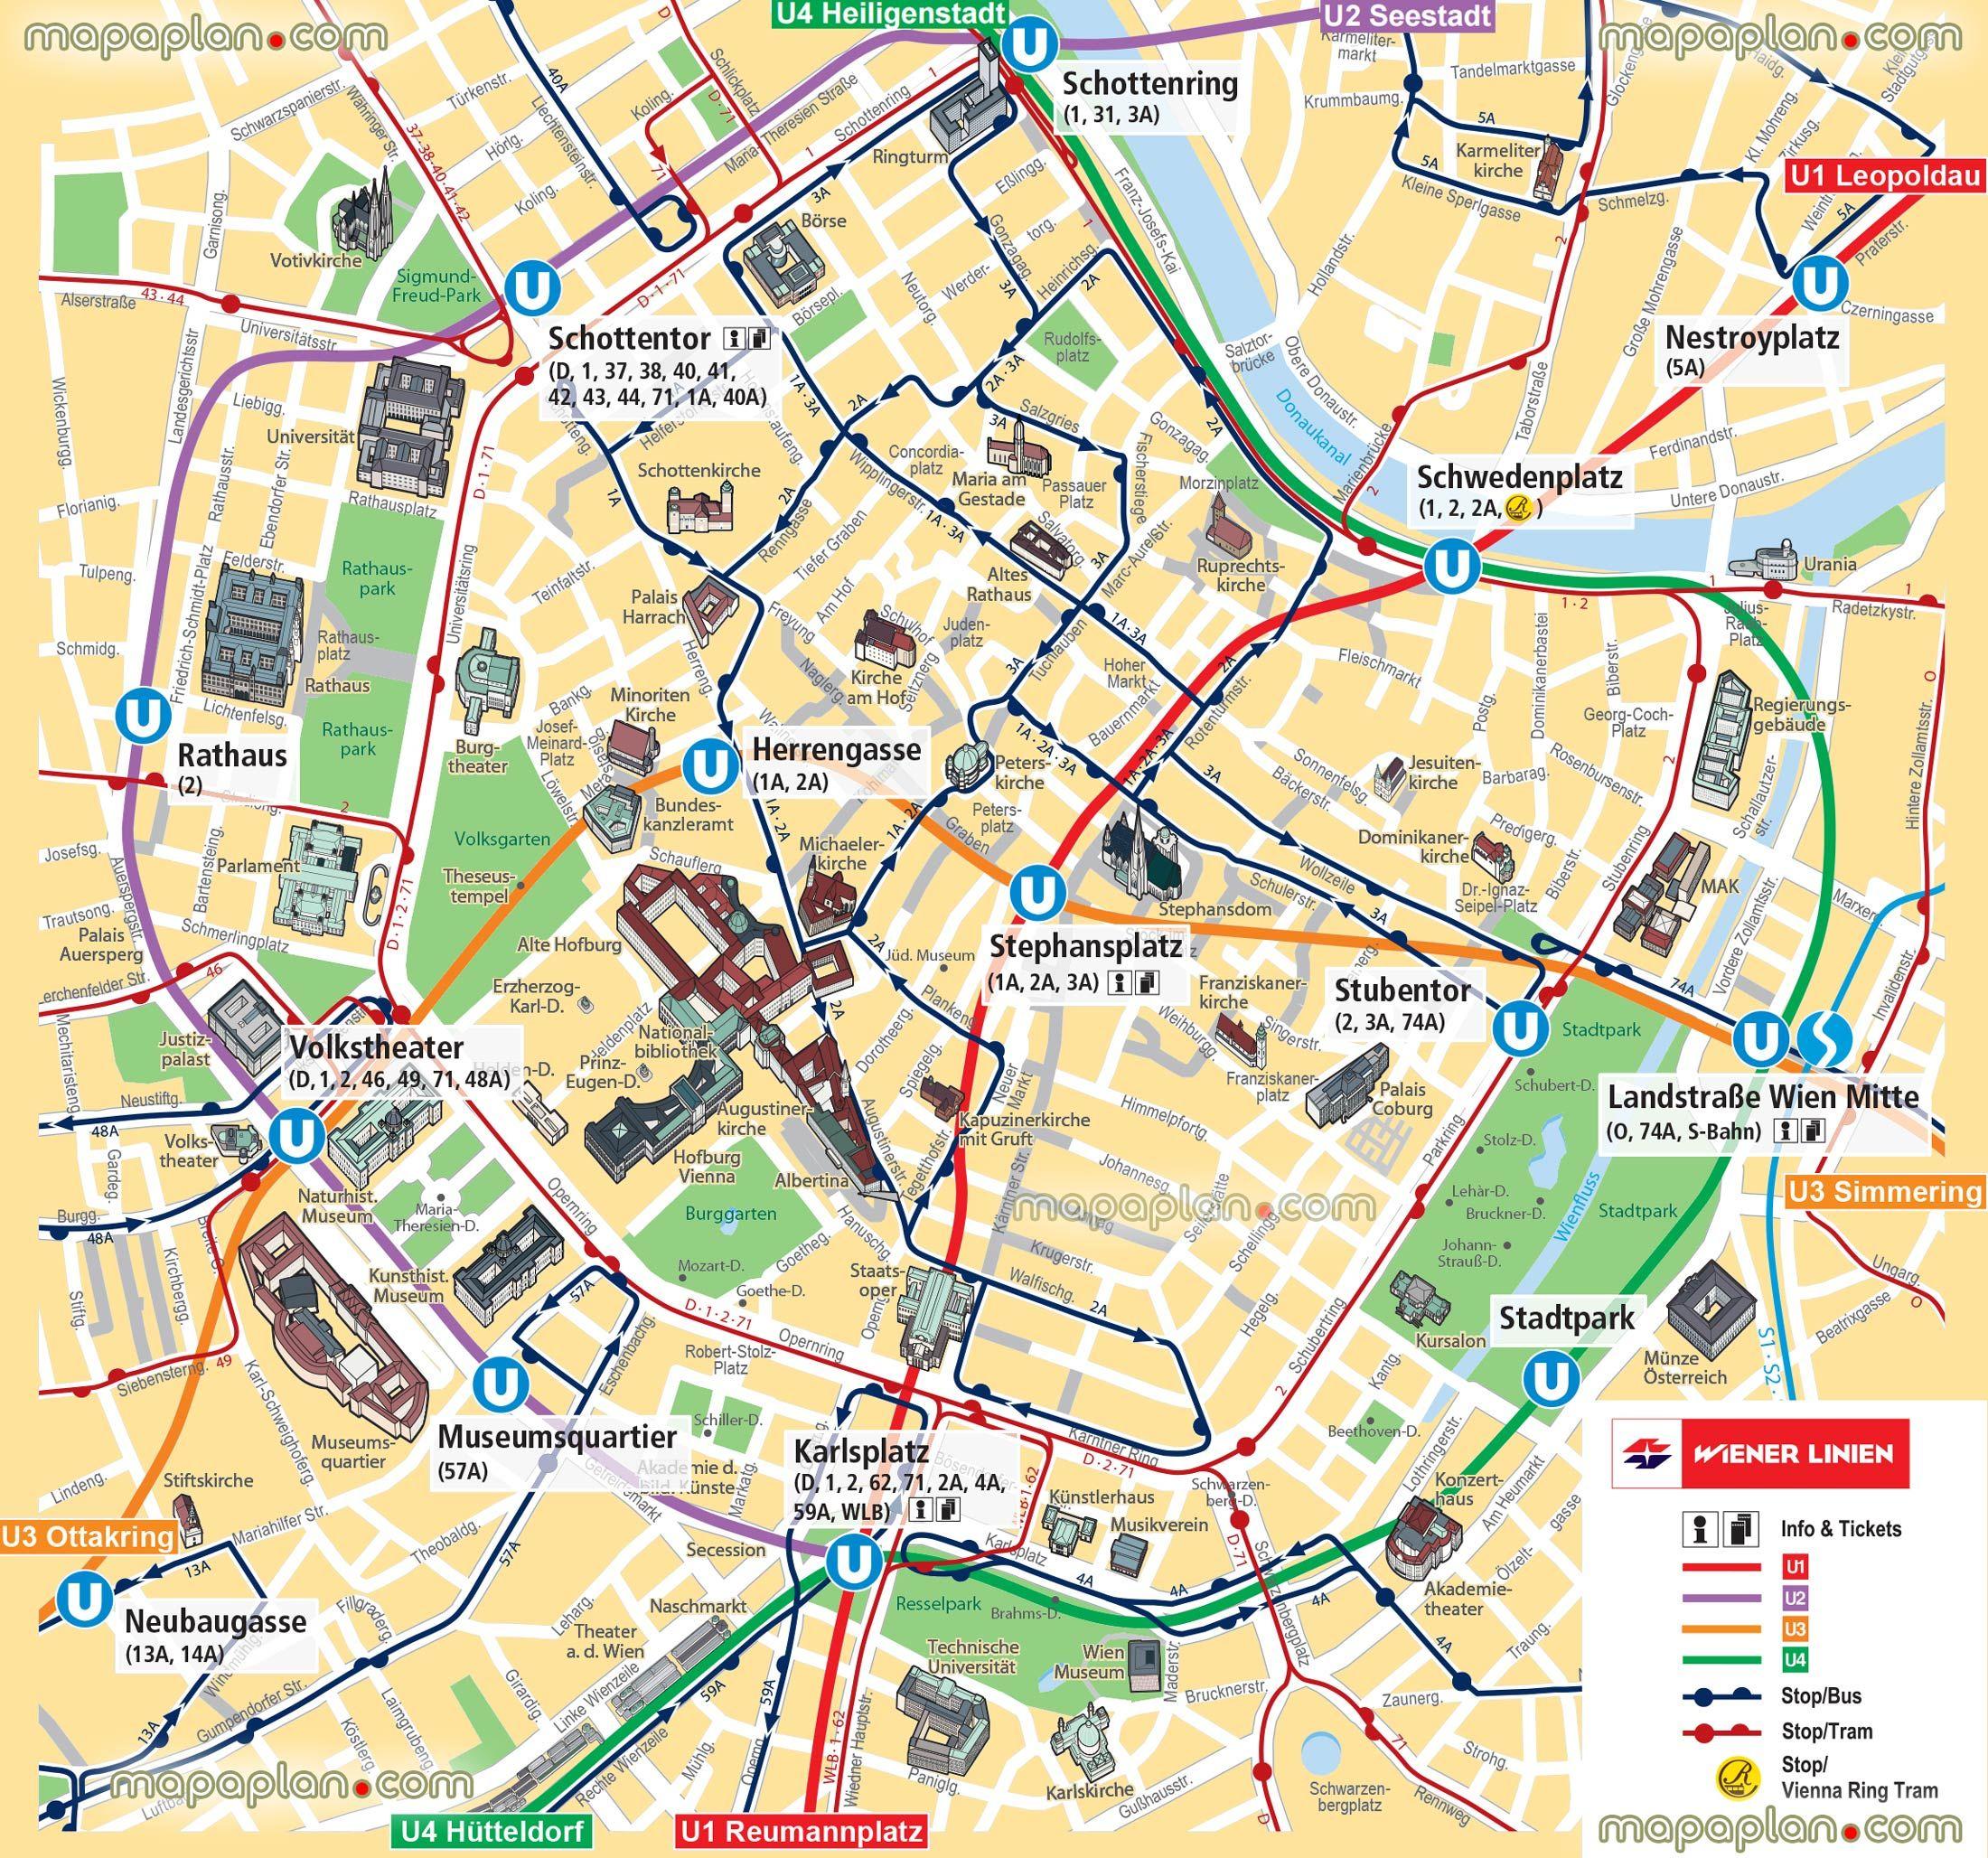 Vienna map UBahn underground subway metro stations tram stops